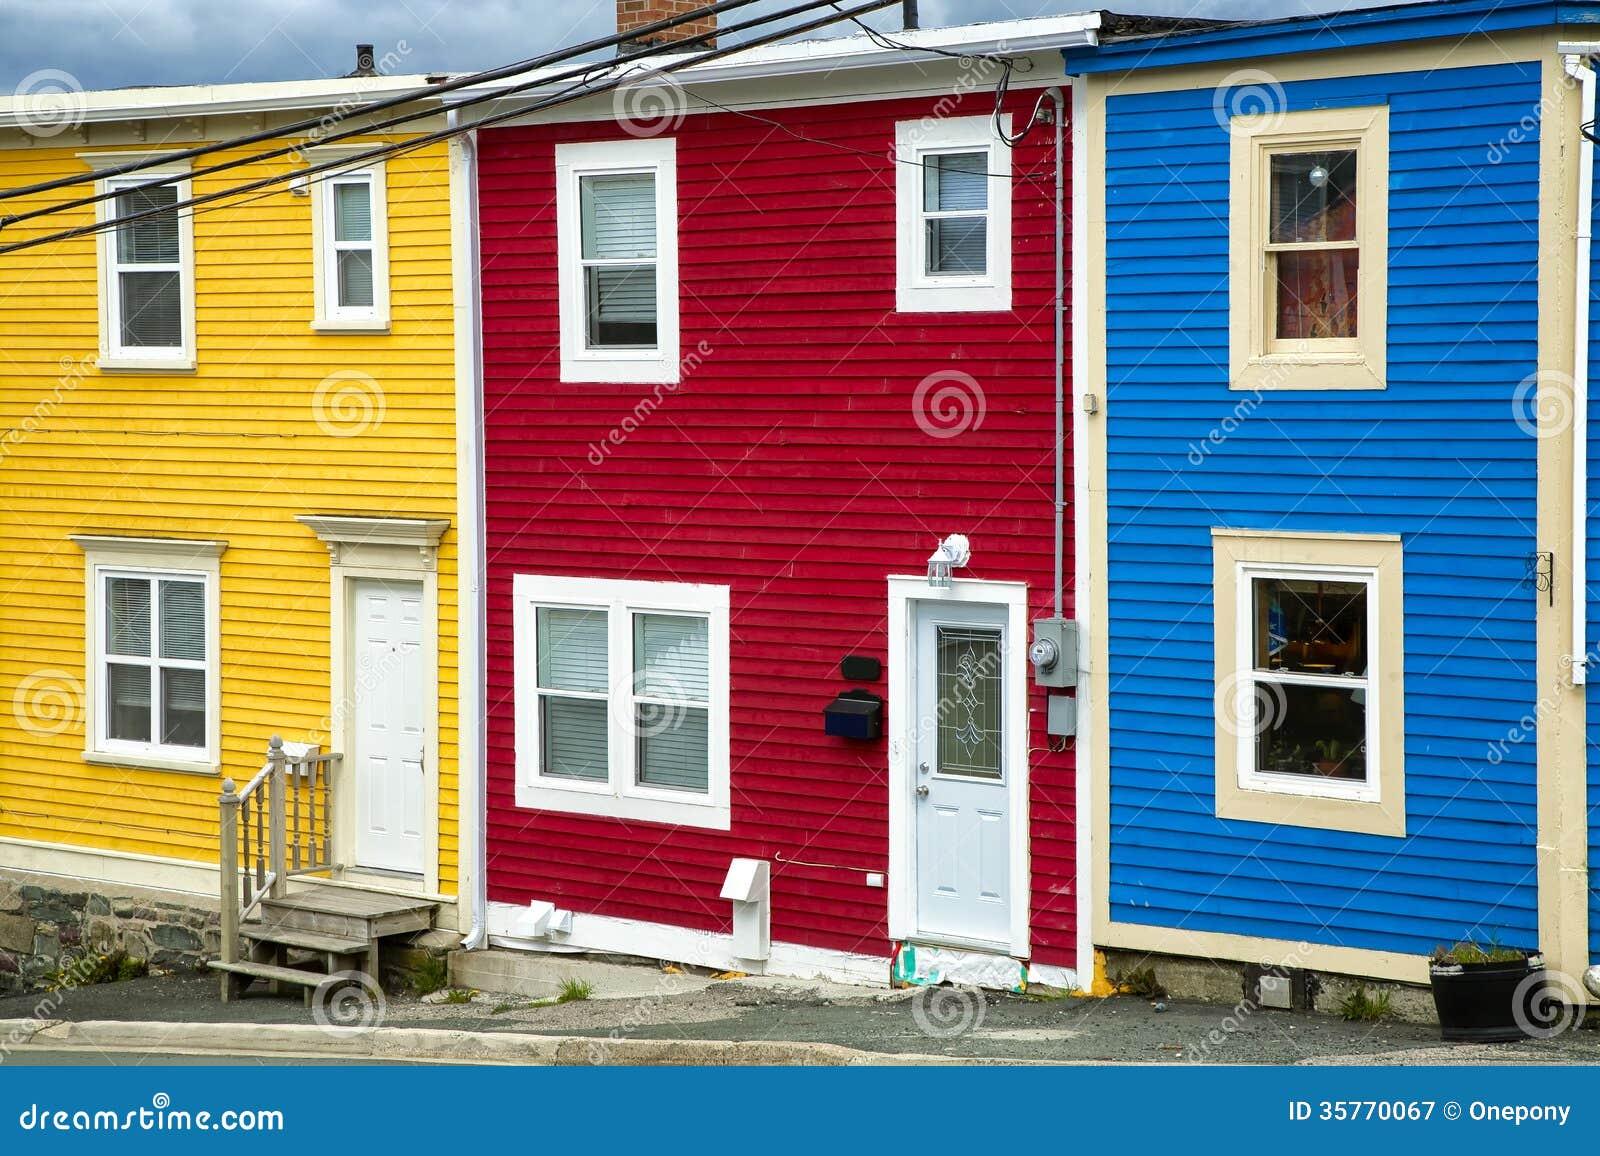 Newfoundland houses royalty free stock photography image for Newfoundland houses